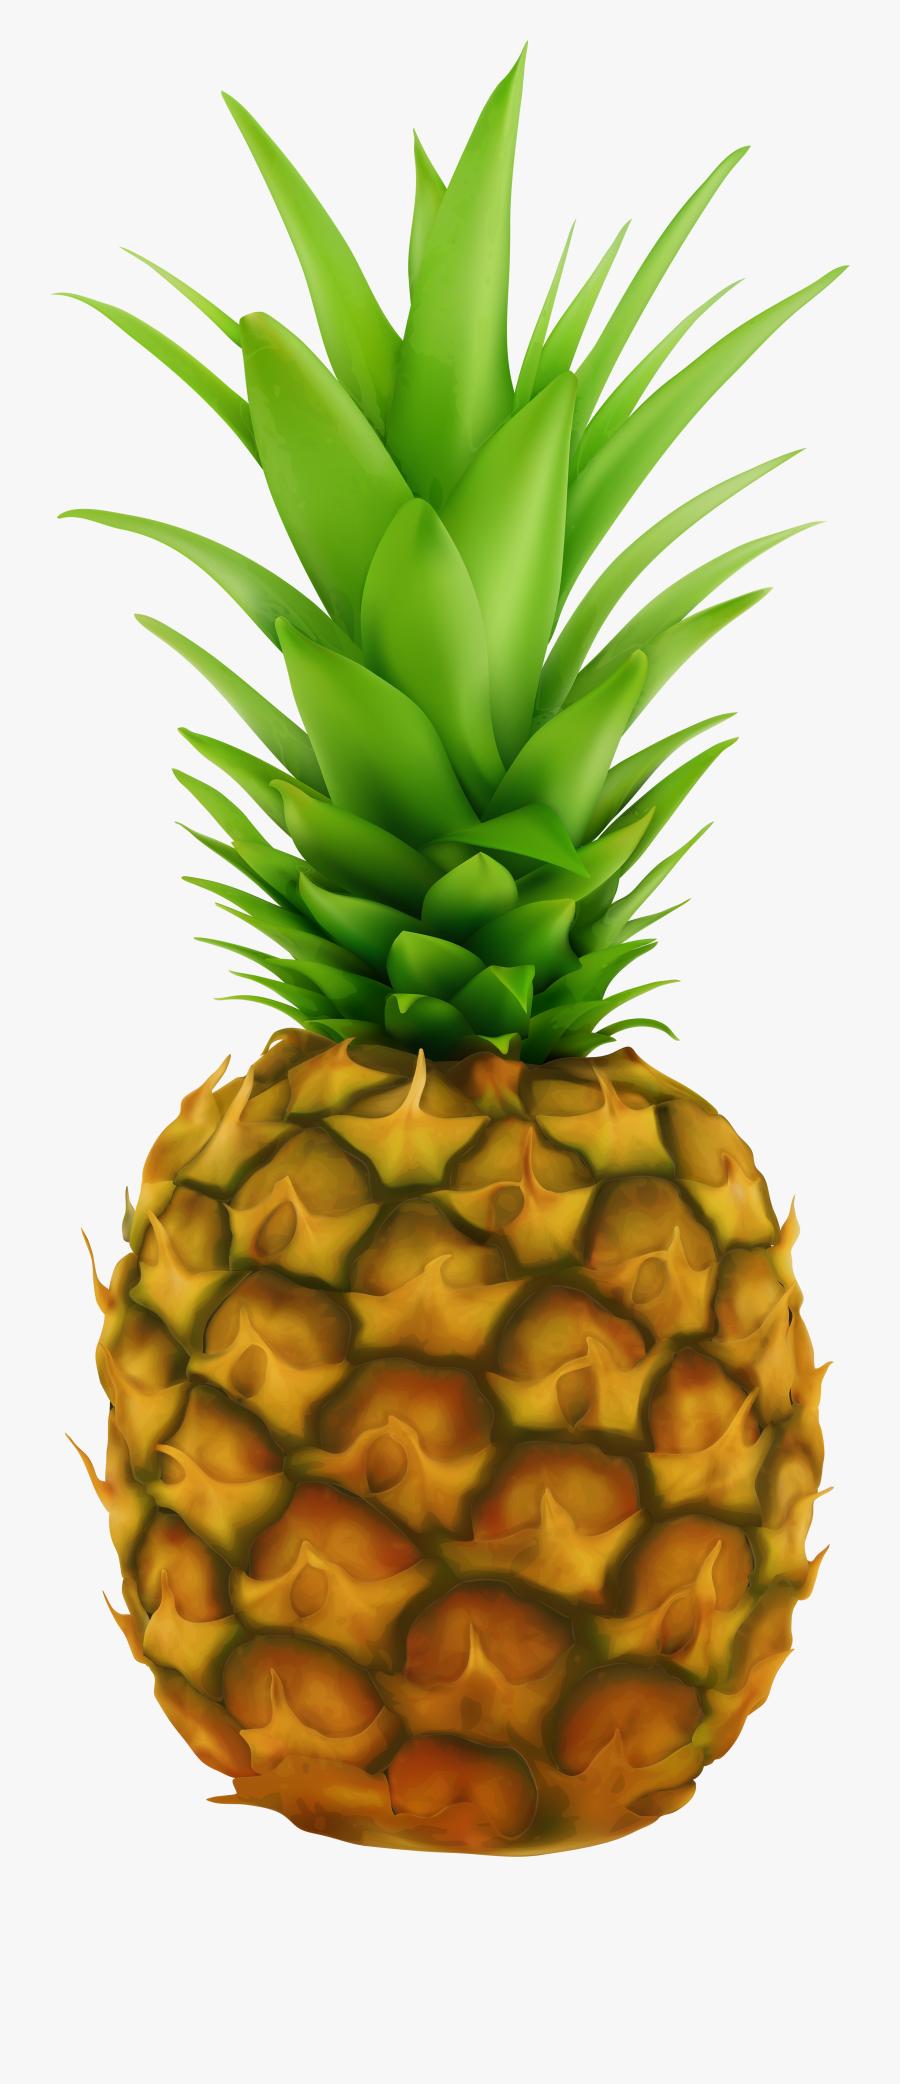 Pineapple Transparent Clip Art Image - Pineapple Fruit Transparent Background, Transparent Clipart